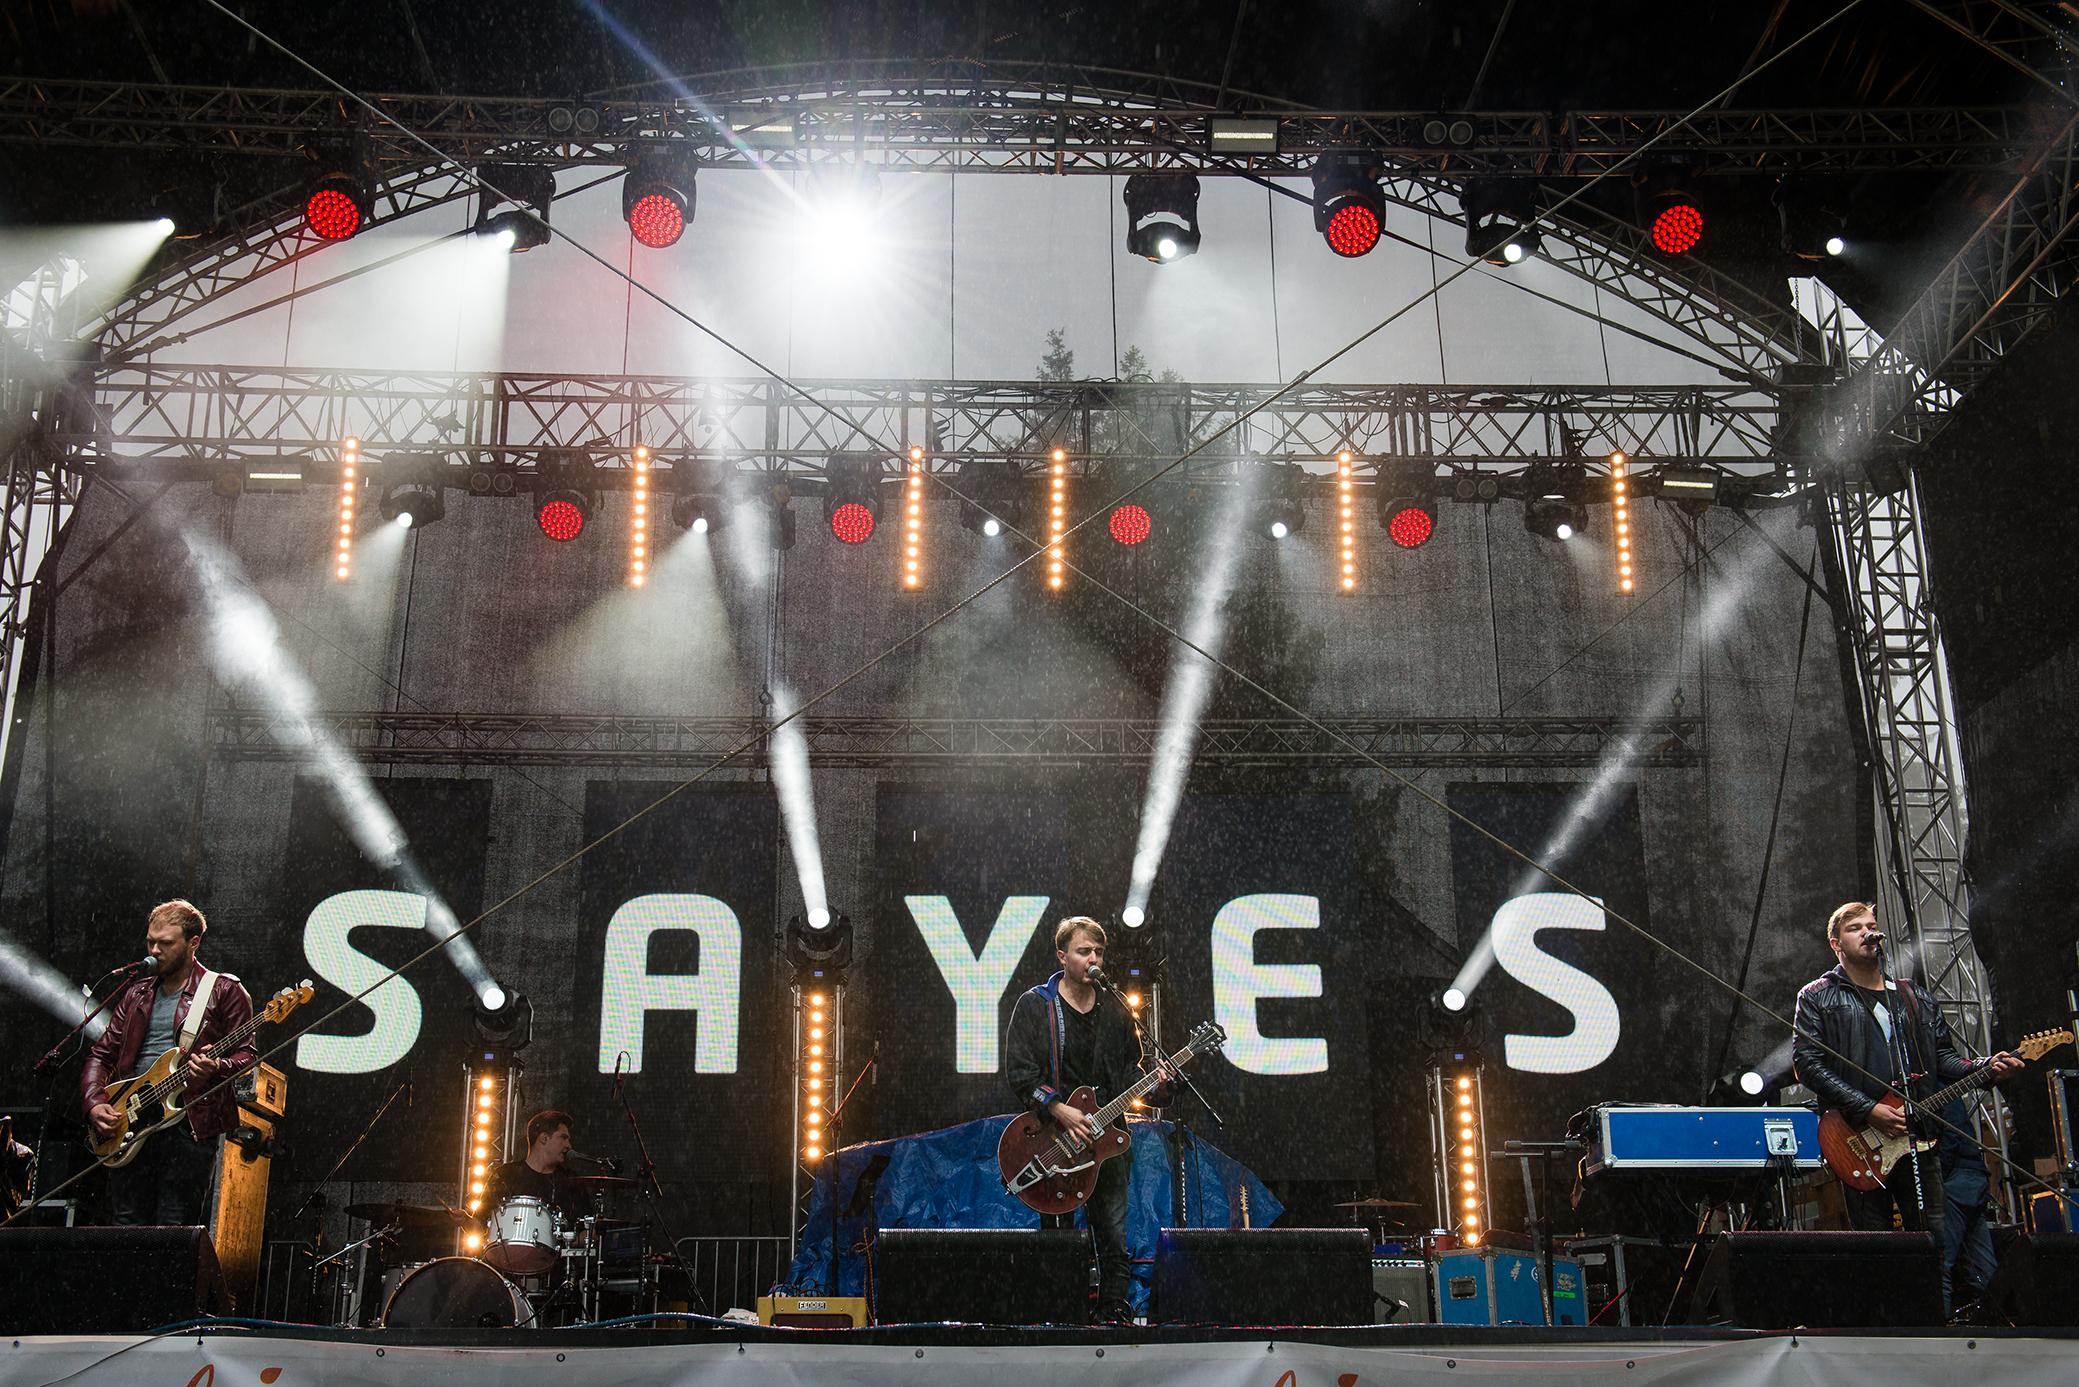 sayes_1.jpg